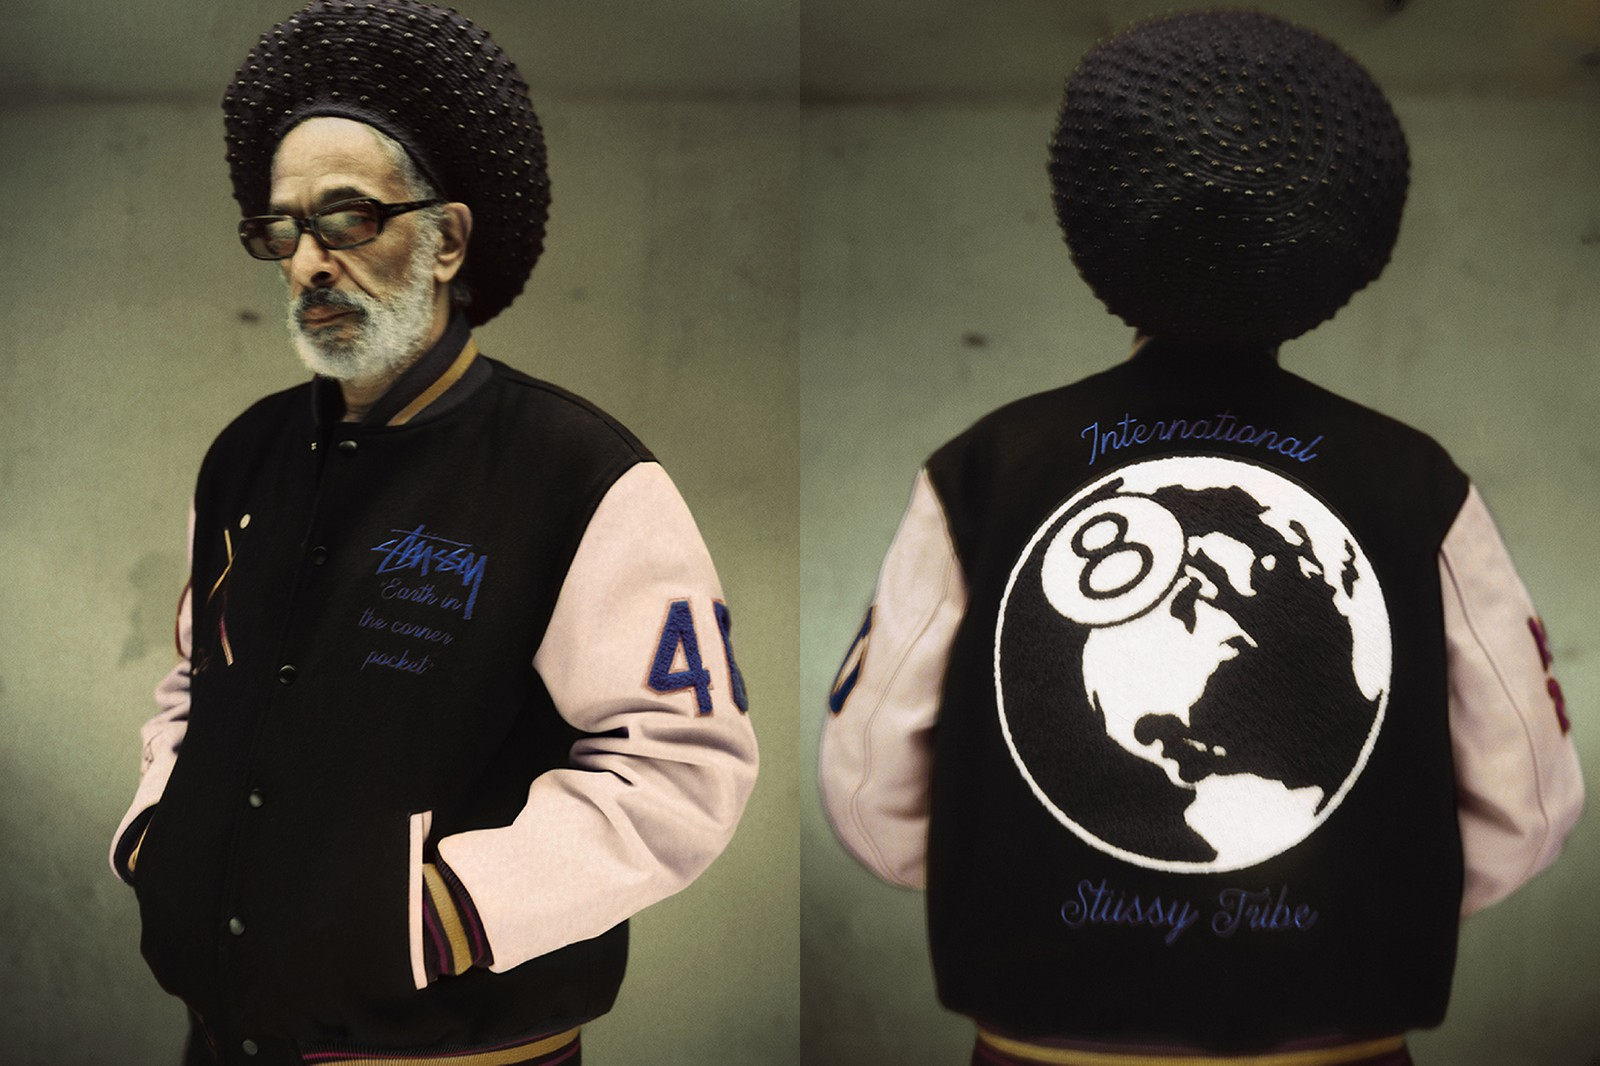 Letterman Jacket 为何能保持近一个世纪的生命力|棒球夹克变迁史